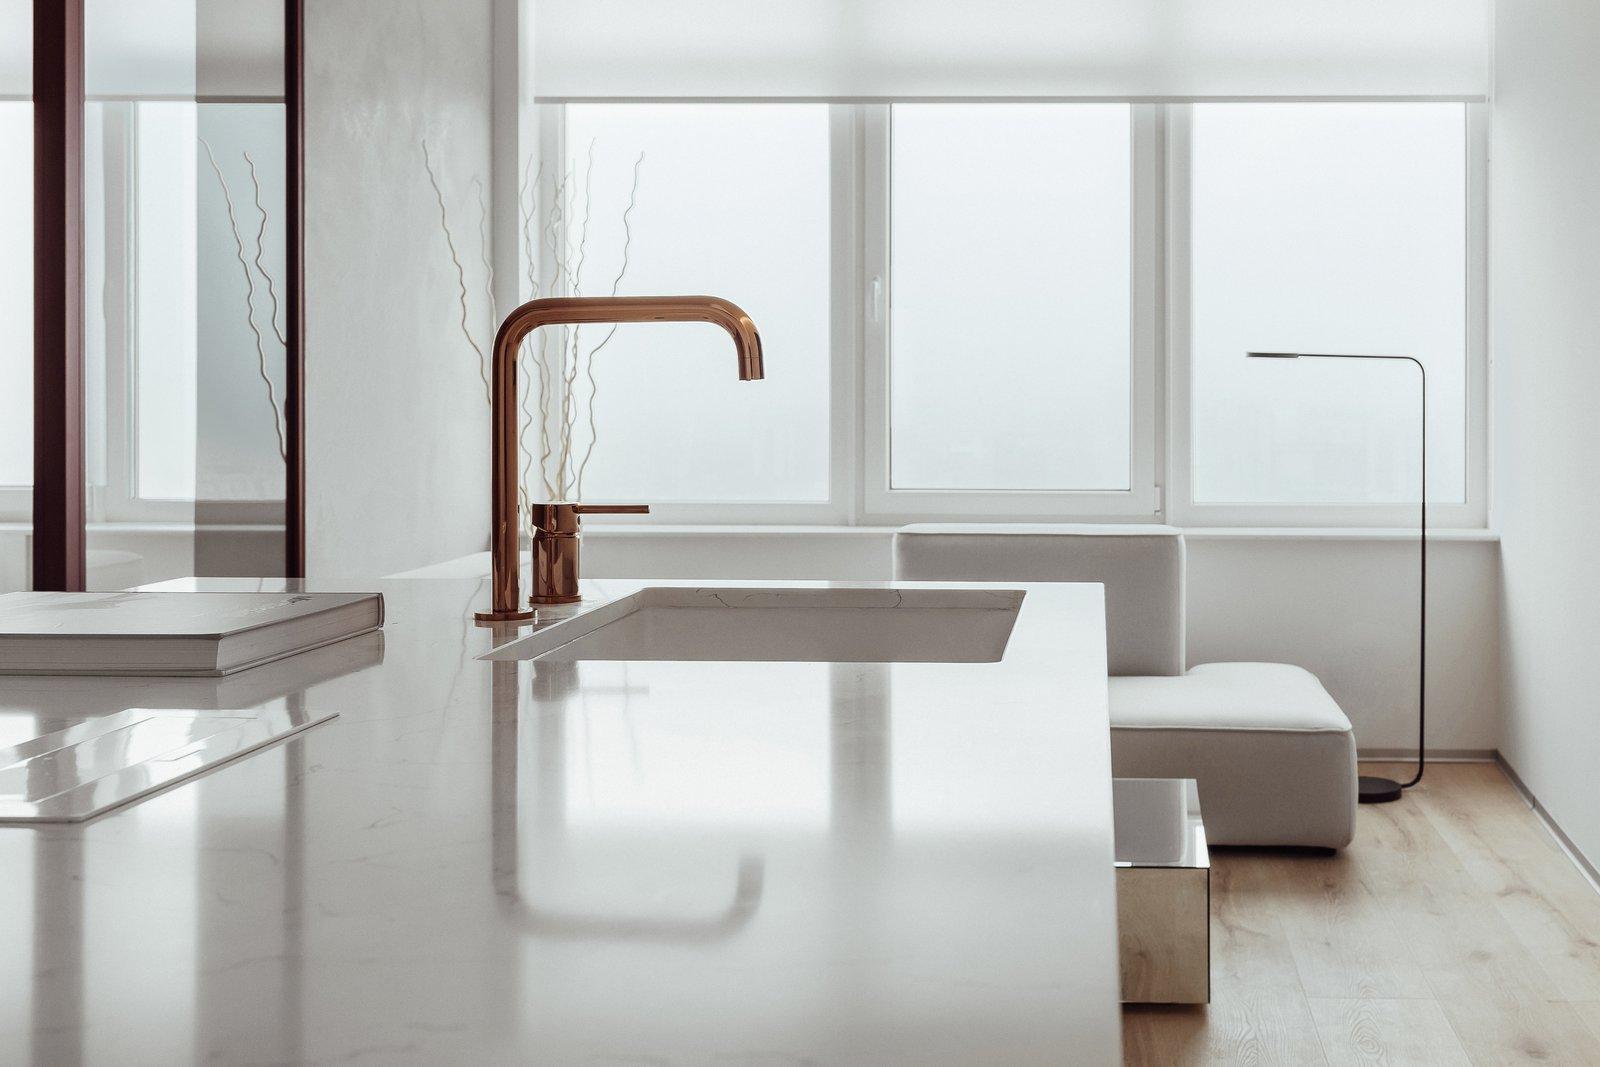 Kitchen, Quartzite Counter, Light Hardwood Floor, and White Cabinet  191 Apt.